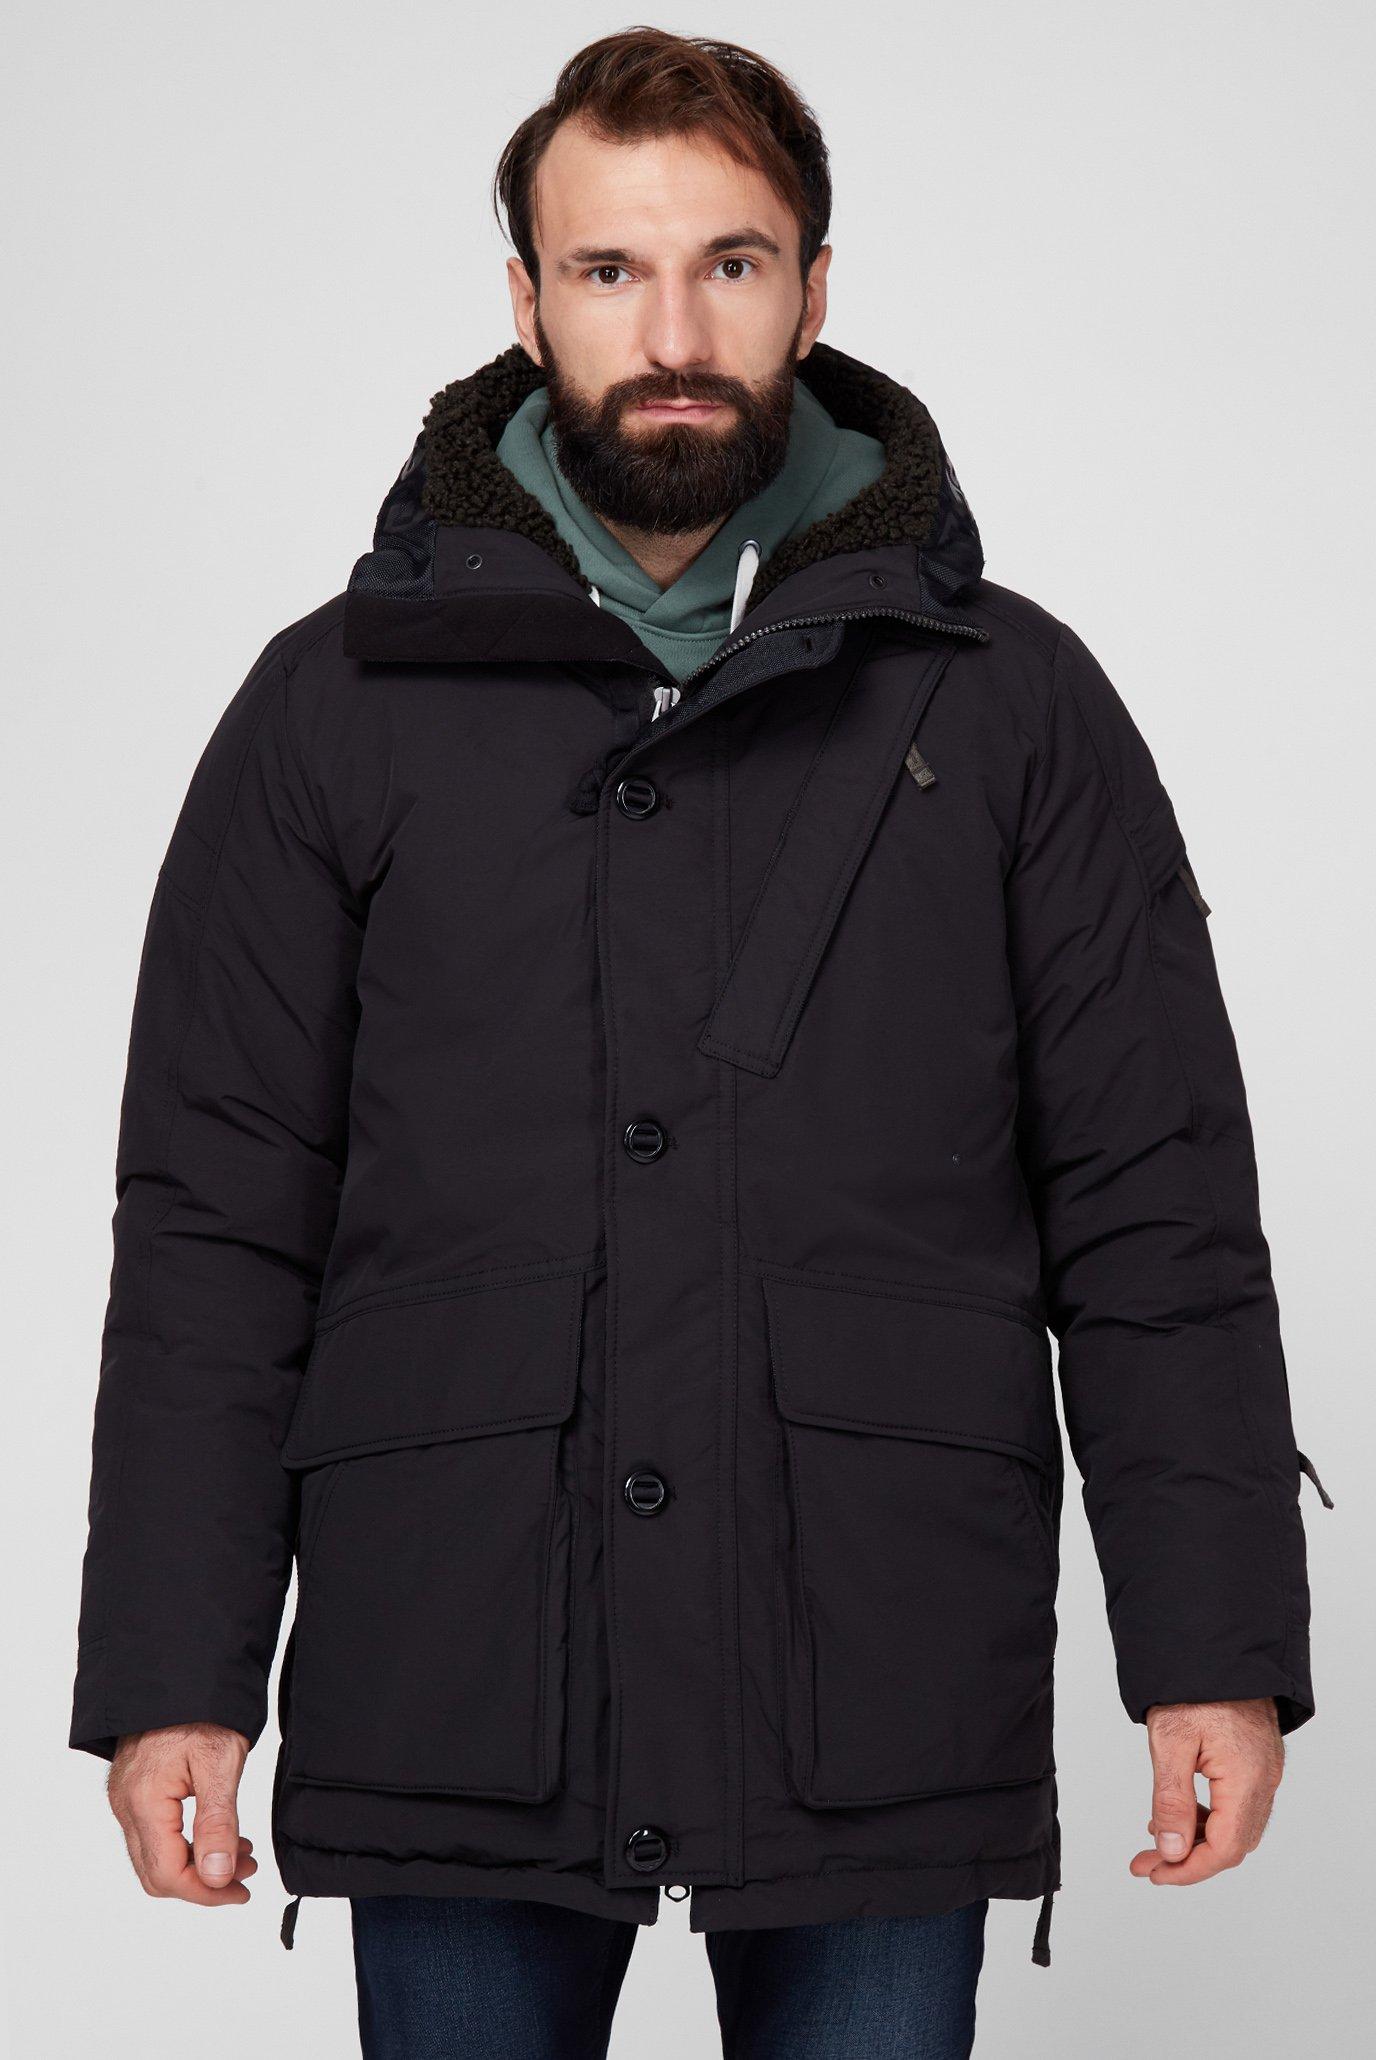 Чоловіча чорна куртка Citishield 1